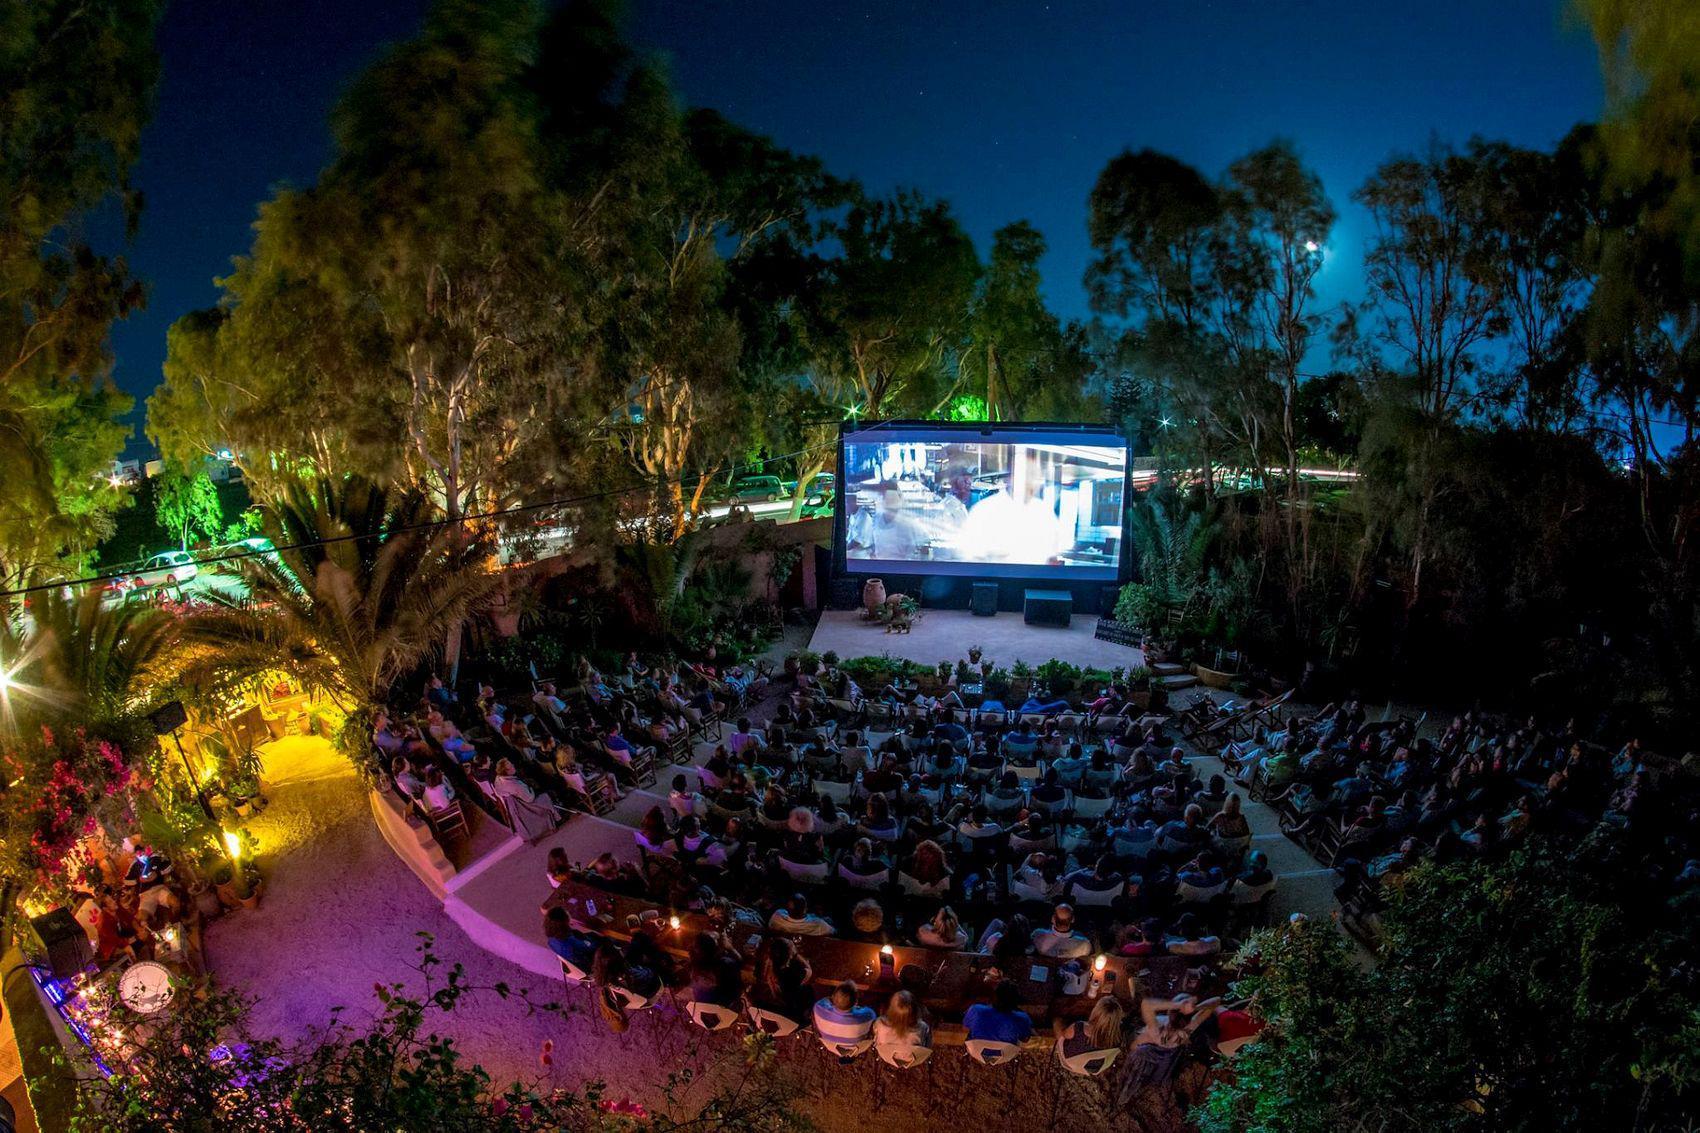 Lockdown: Ανοίγουν μουσεία, θερινά σινεμά, ανοιχτά θέατρα, αθλητικές ακαδημίες - Δείτε τι ημερομηνίες